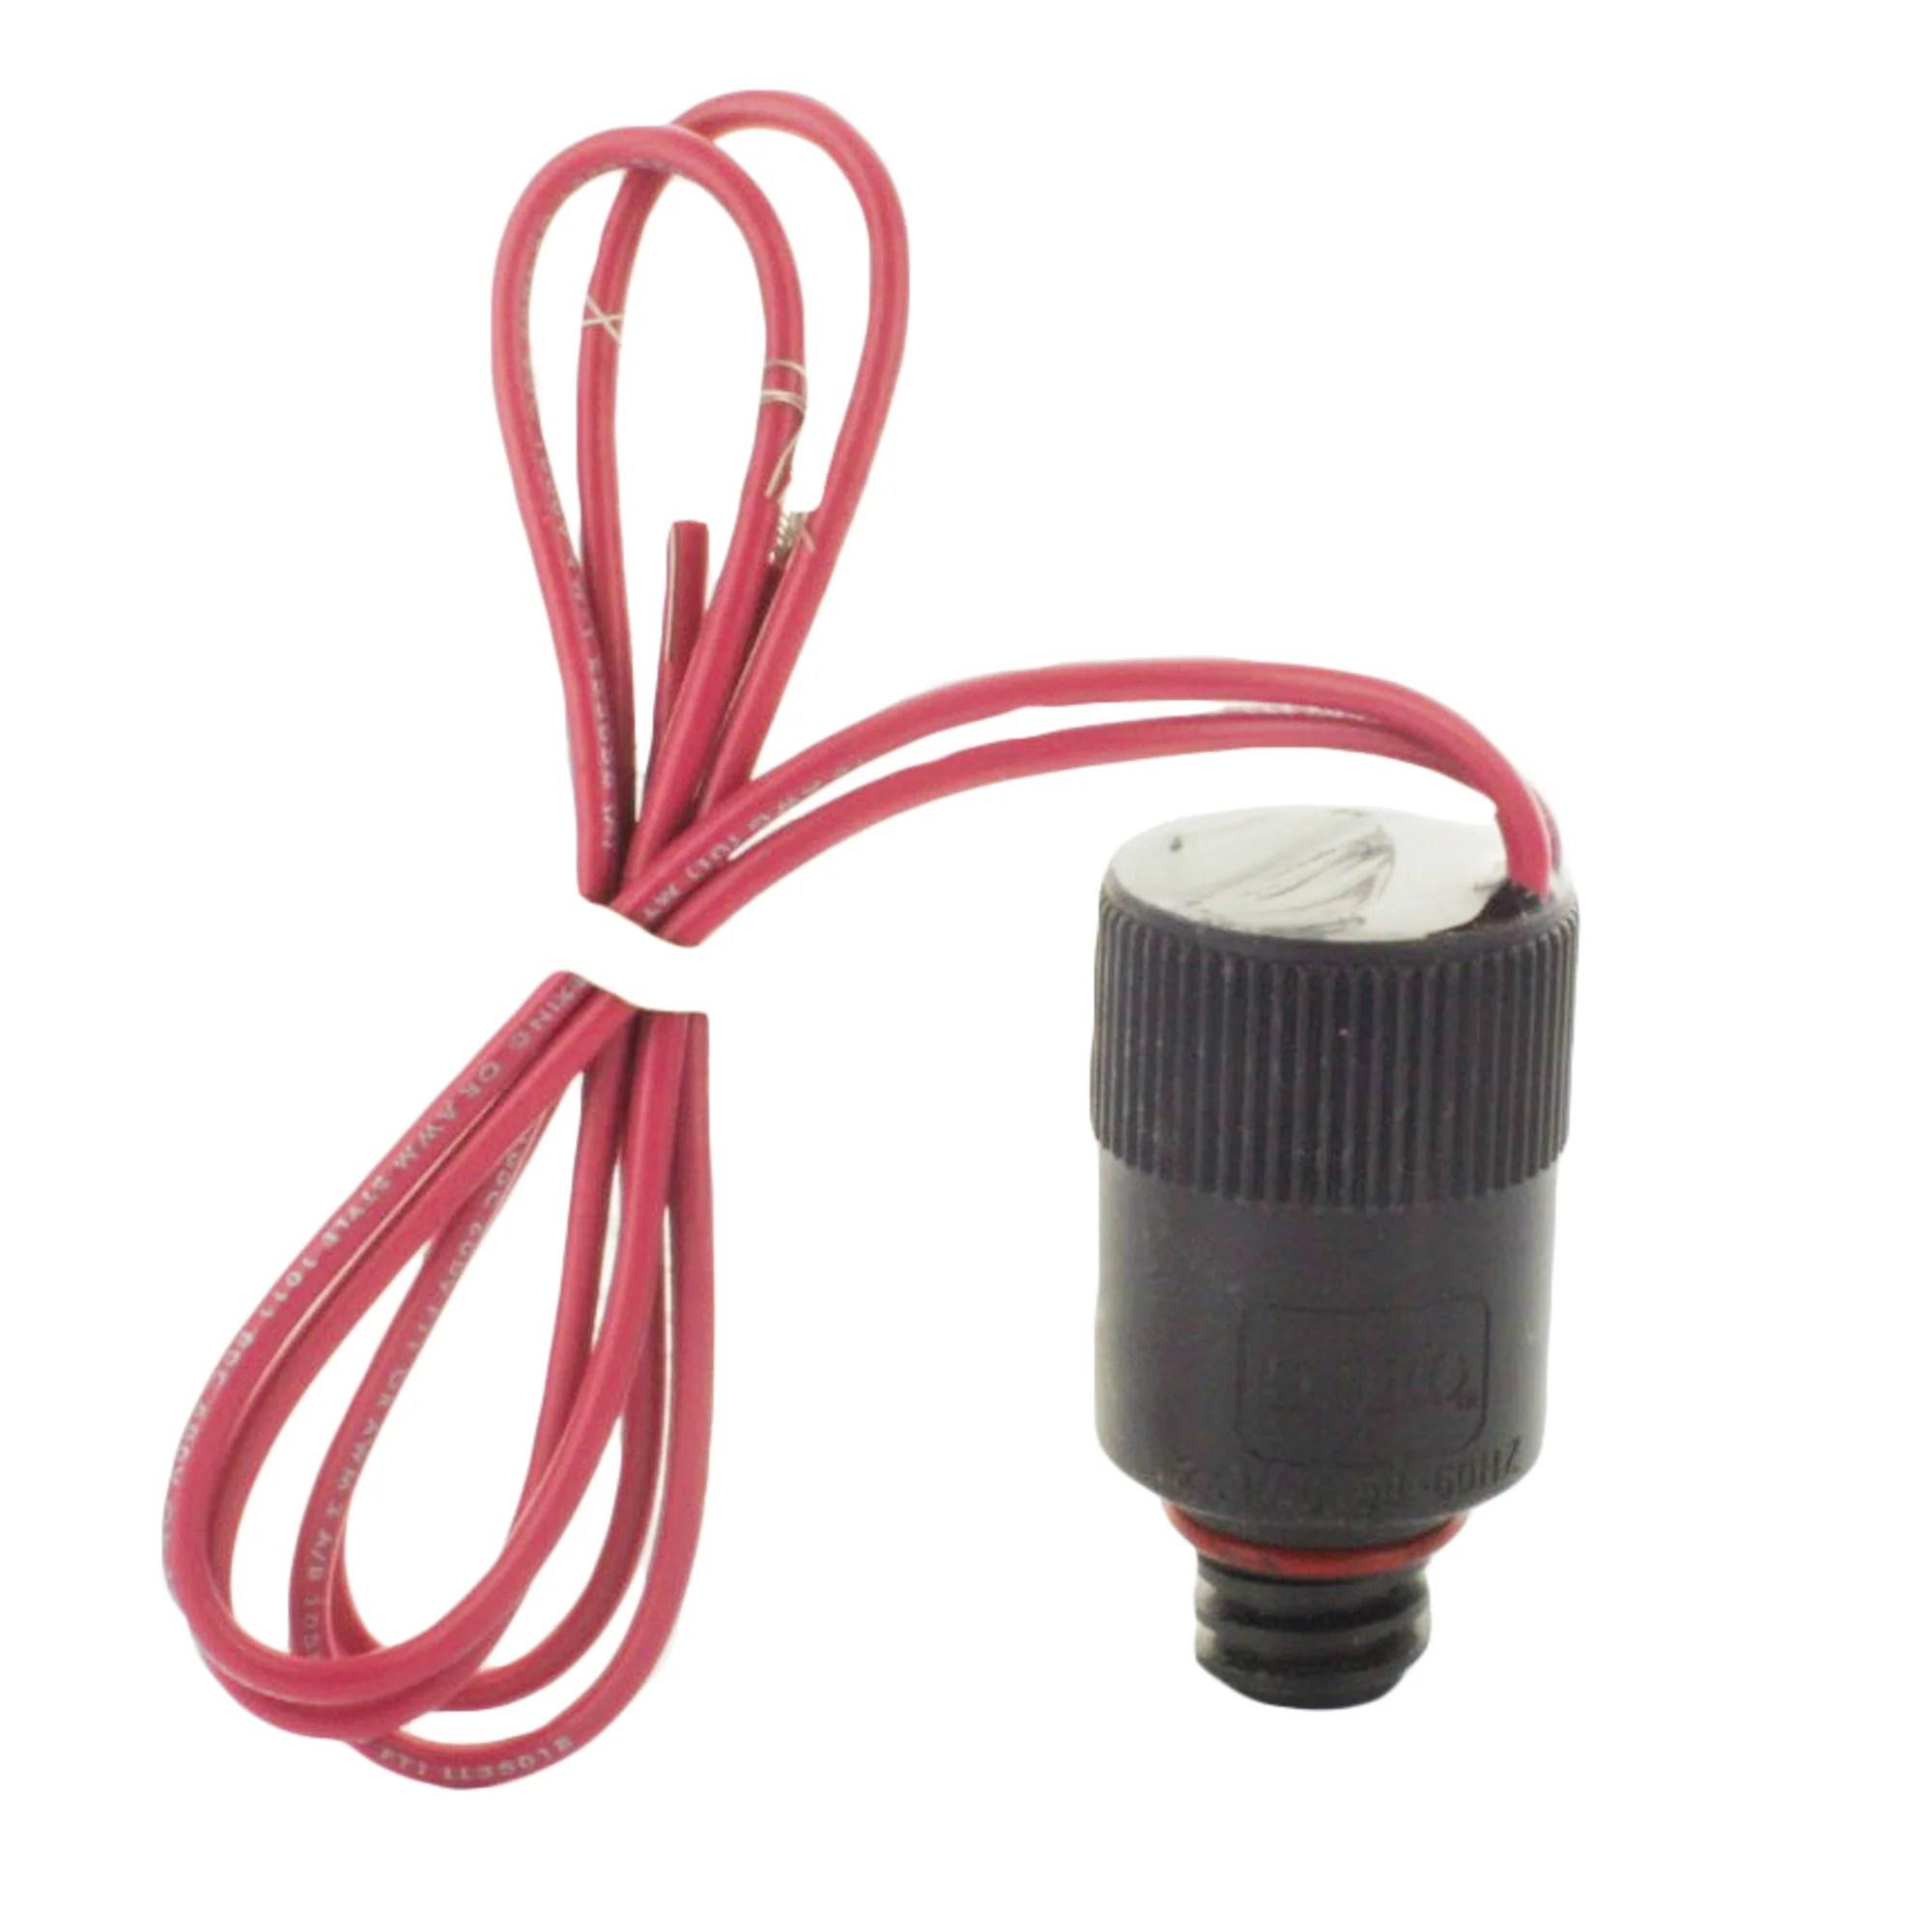 toro 89 0114 flo pro solenoid assembly toro 616 z wiring schematics toro 89 0114 [ 2000 x 2000 Pixel ]